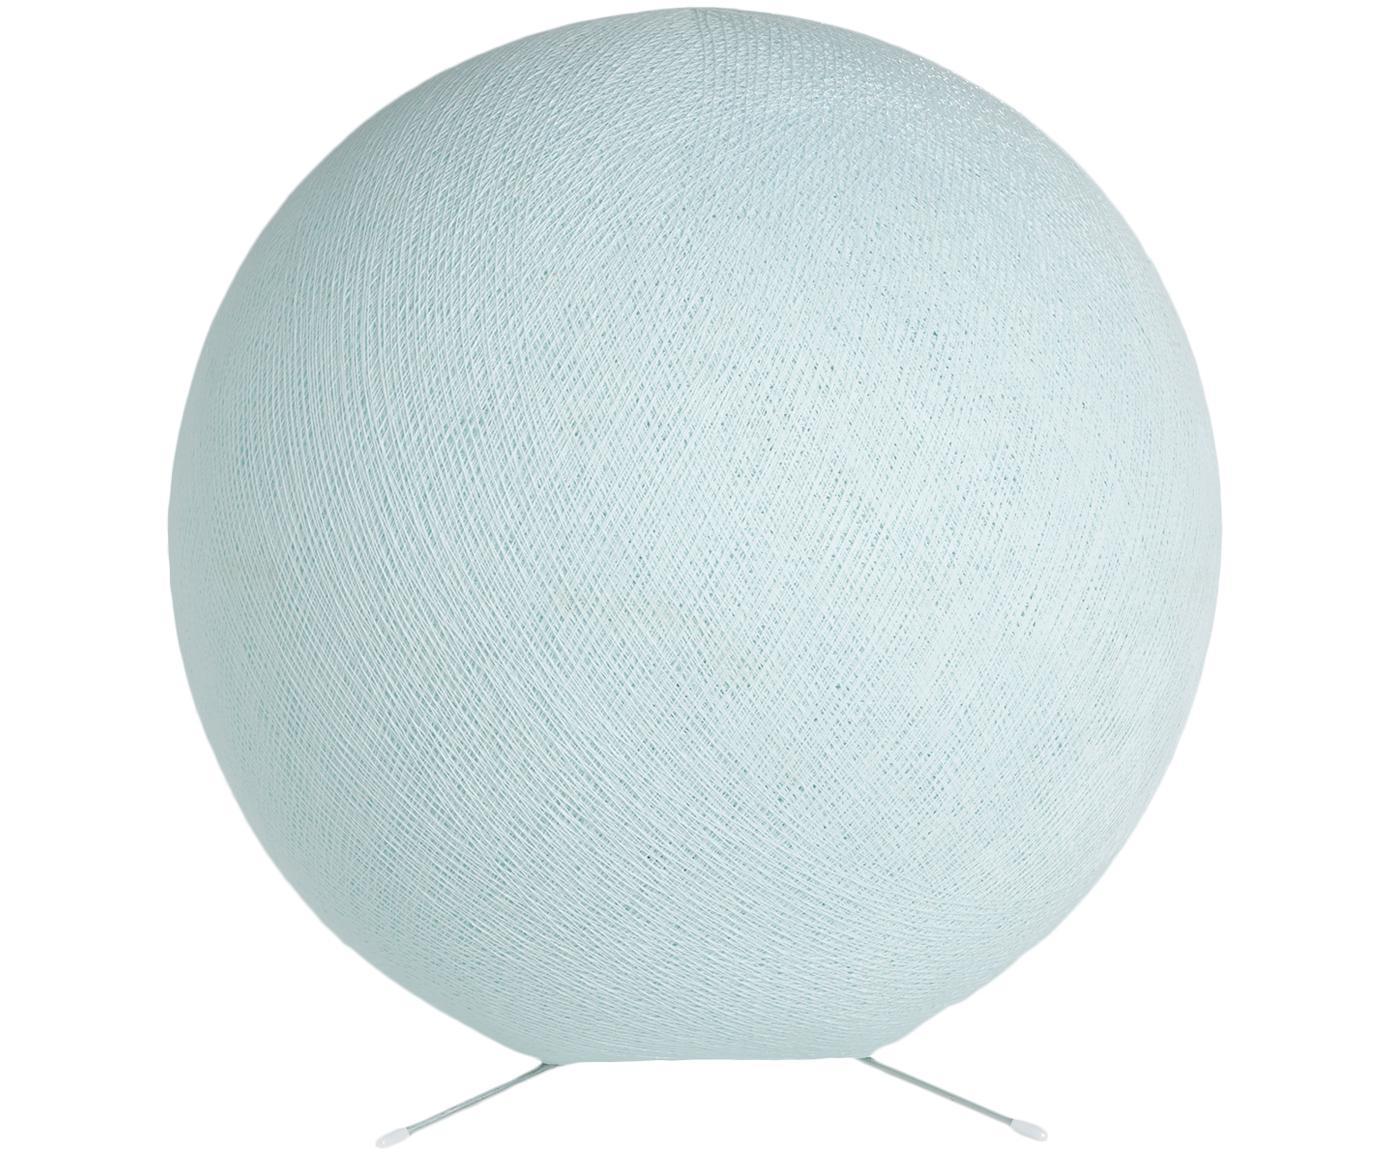 Lámpara de mesa Colorain, Pantalla: poliéster, Cable: plástico, Azul claro, Ø 36 cm